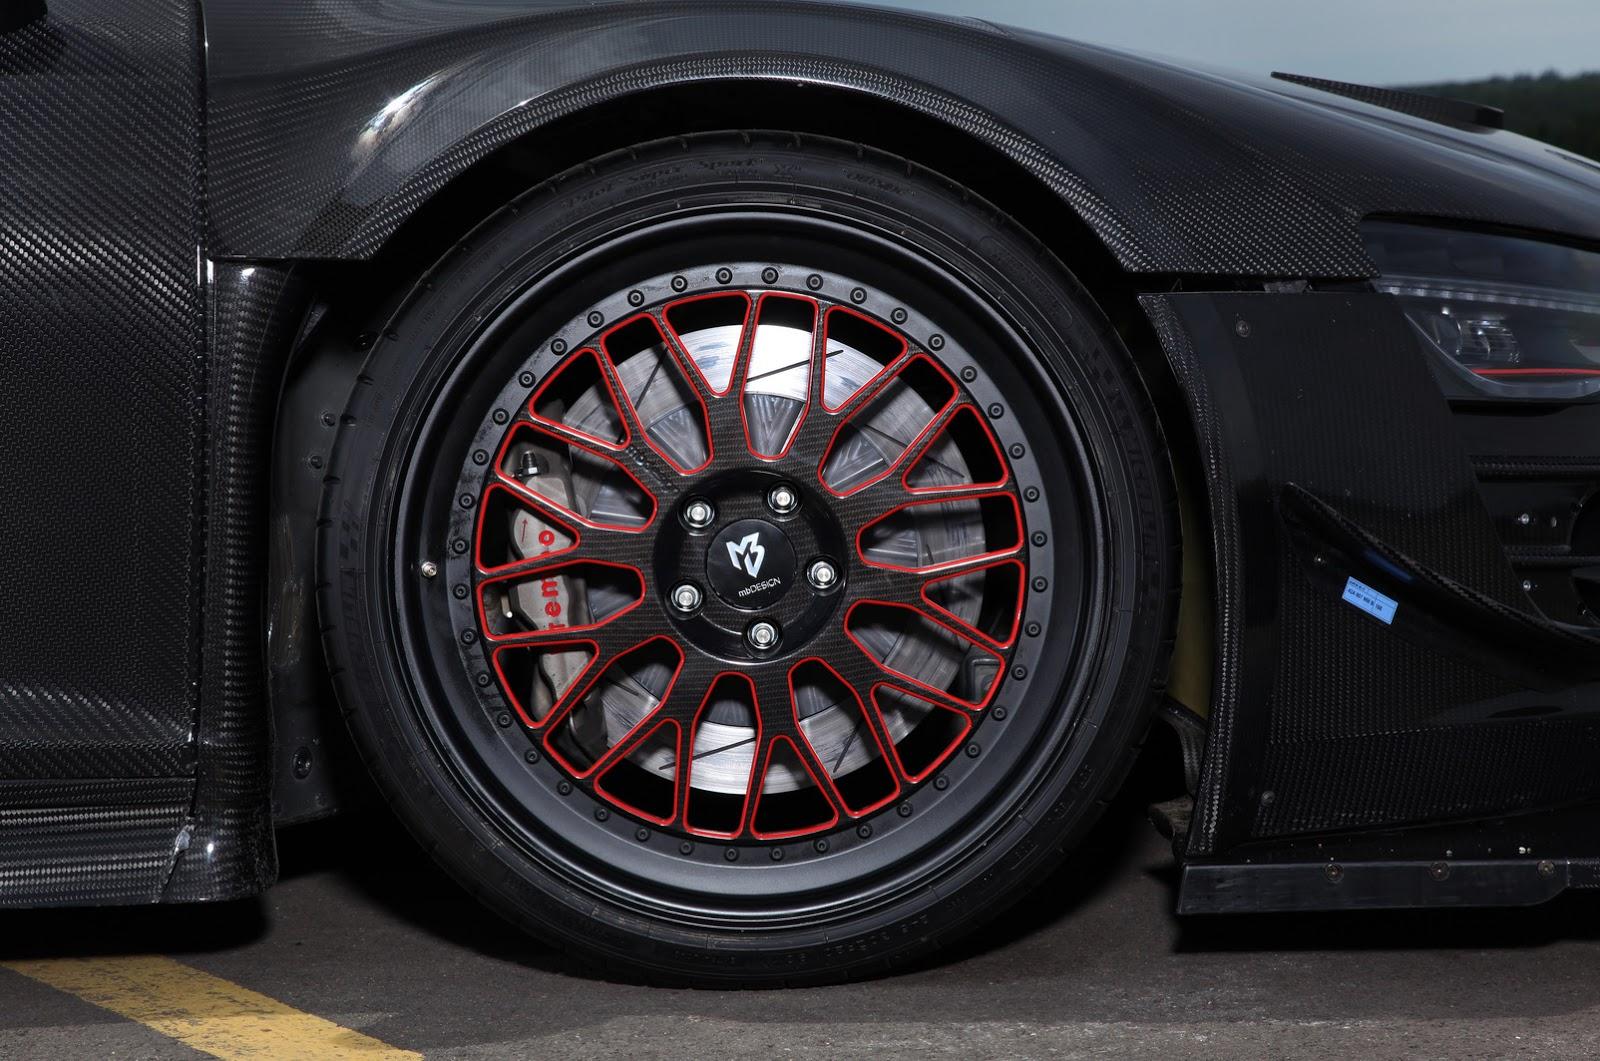 Audi-R8-Recon-MR8-9.jpg